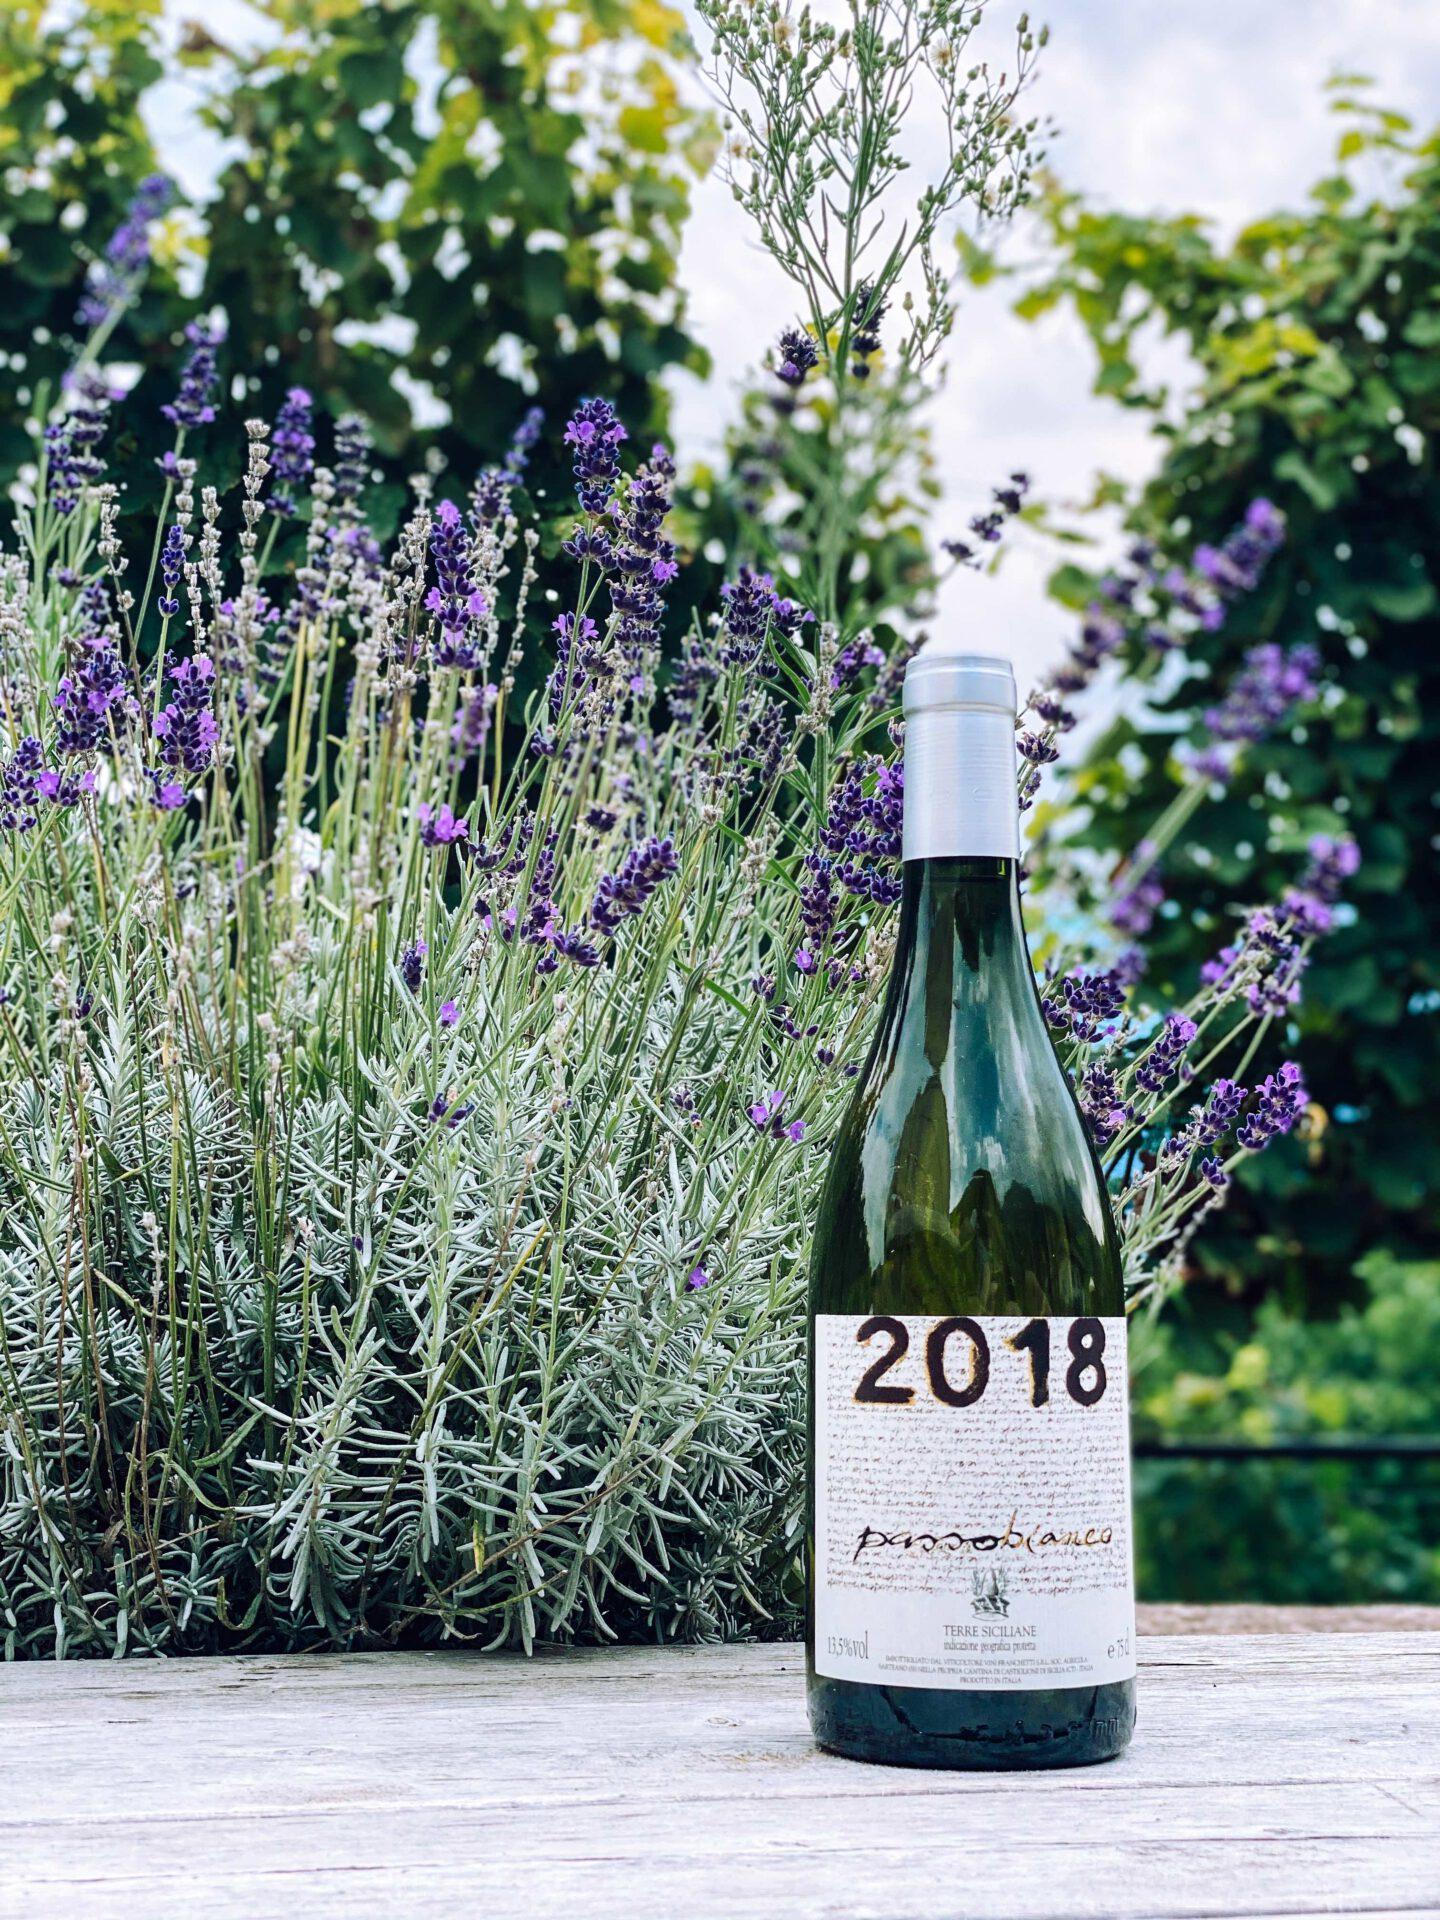 passobianco white wine italy Wein-Geheimtipps